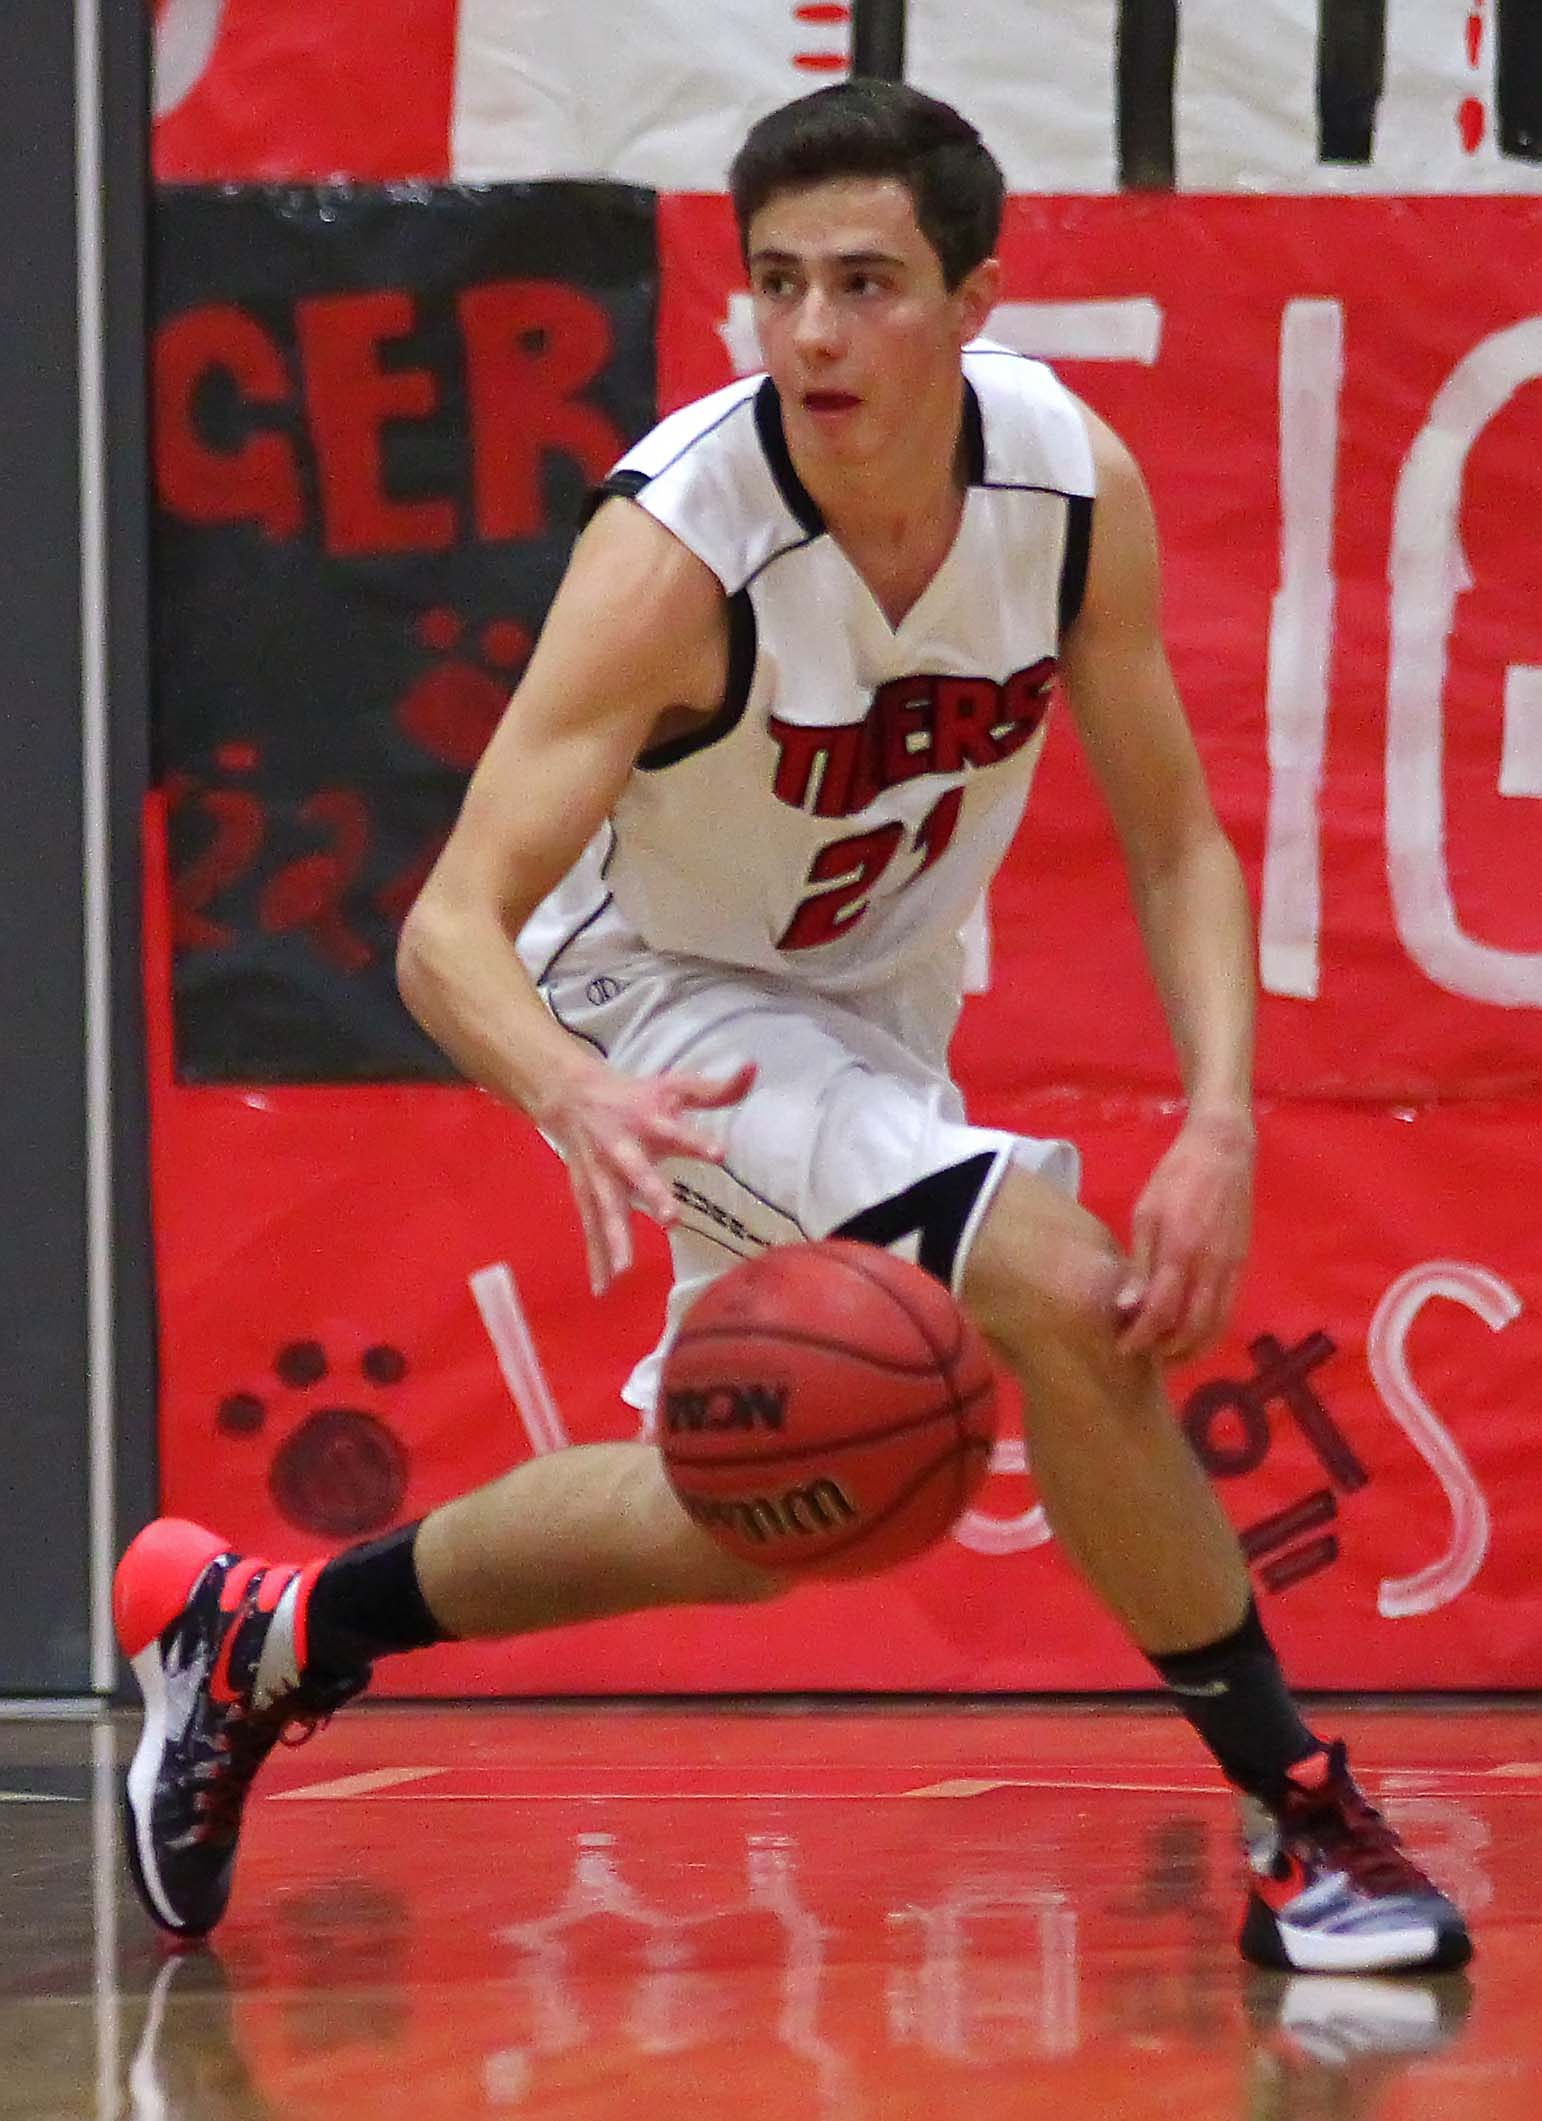 Hurricane's  Josh Parker (21), Hurricane vs. Richfield, Boys Basketball, Hurricane, Utah, Dec. 16, 2015,   File photo by Robert Hoppie, ASPpix.com, St. George News